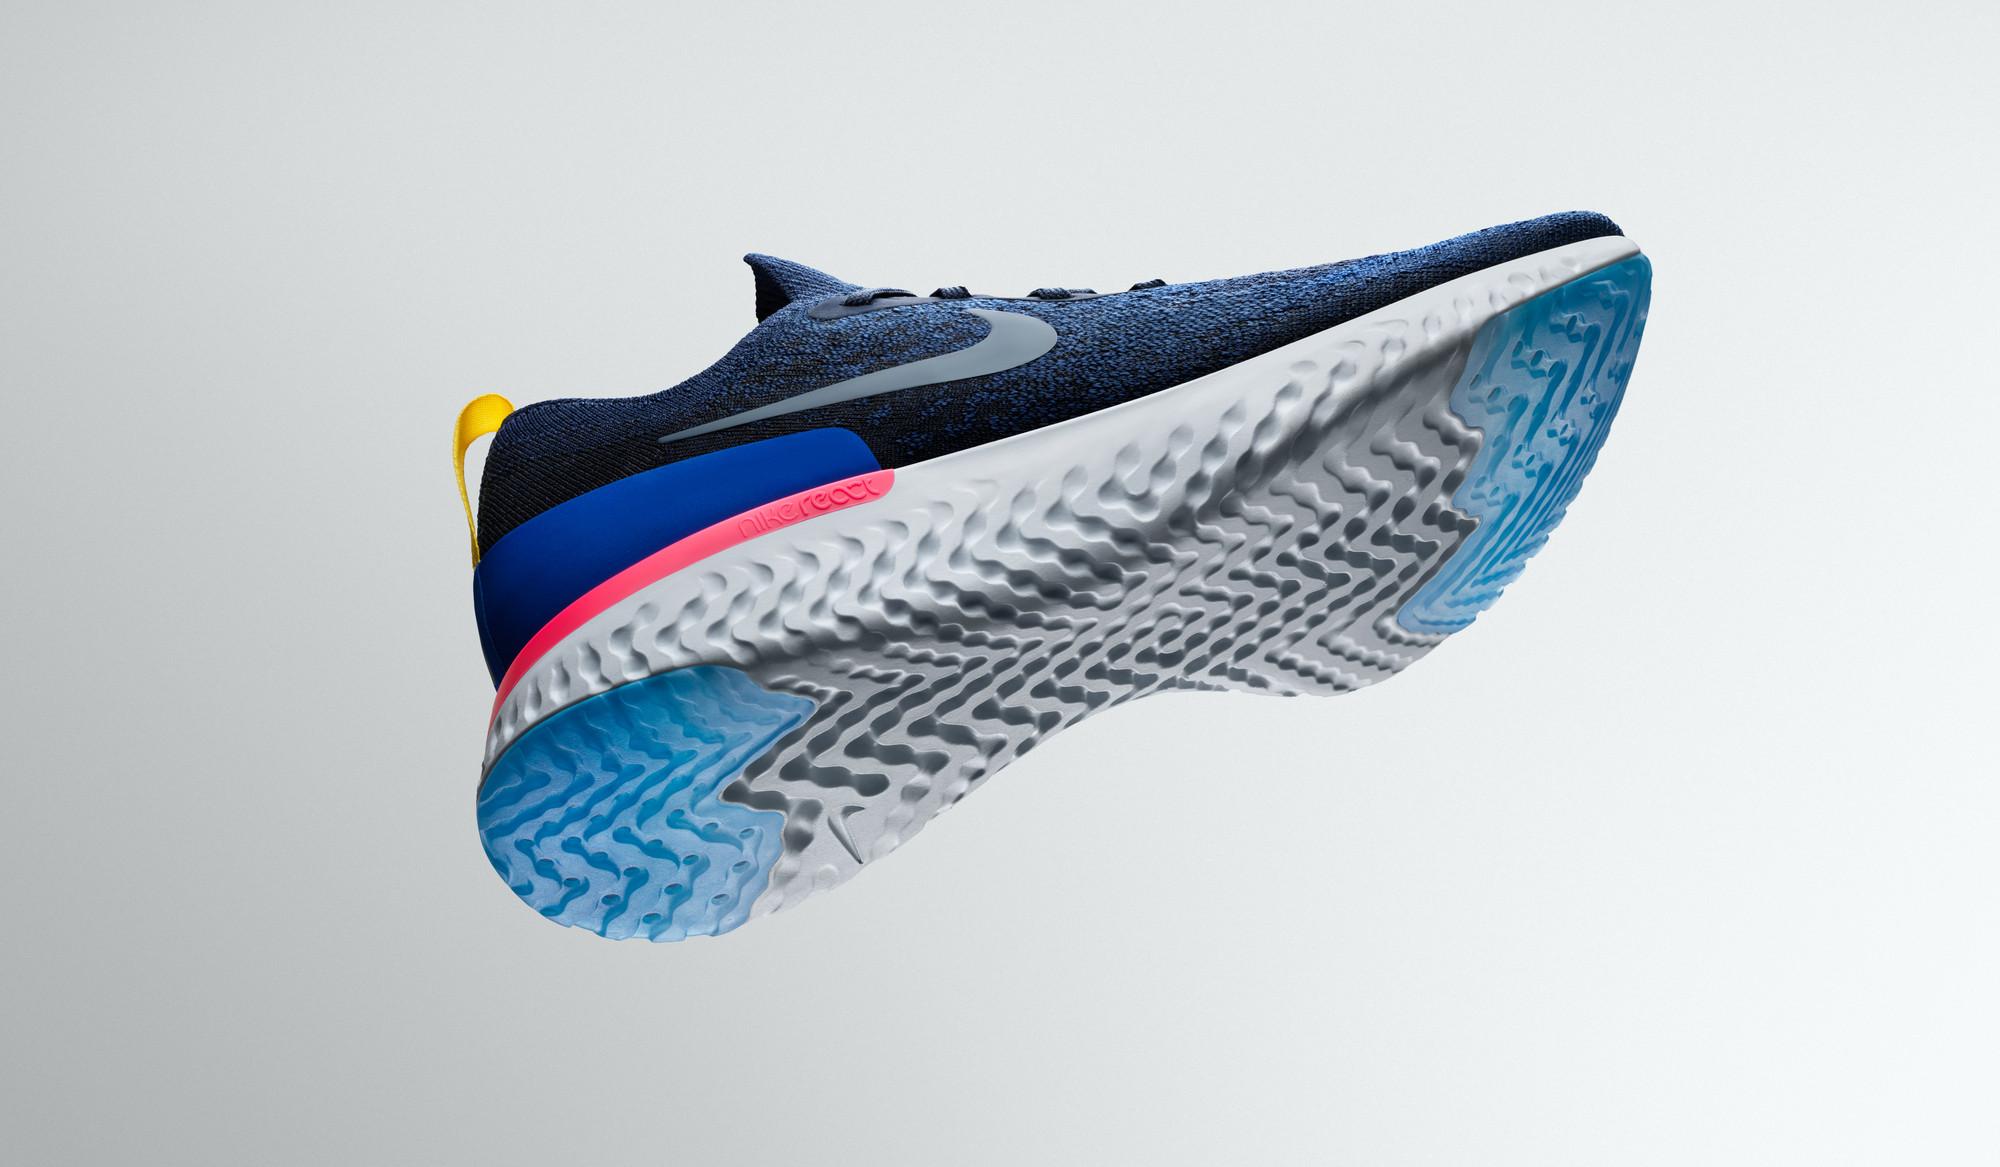 Nike-React-bleu-2018